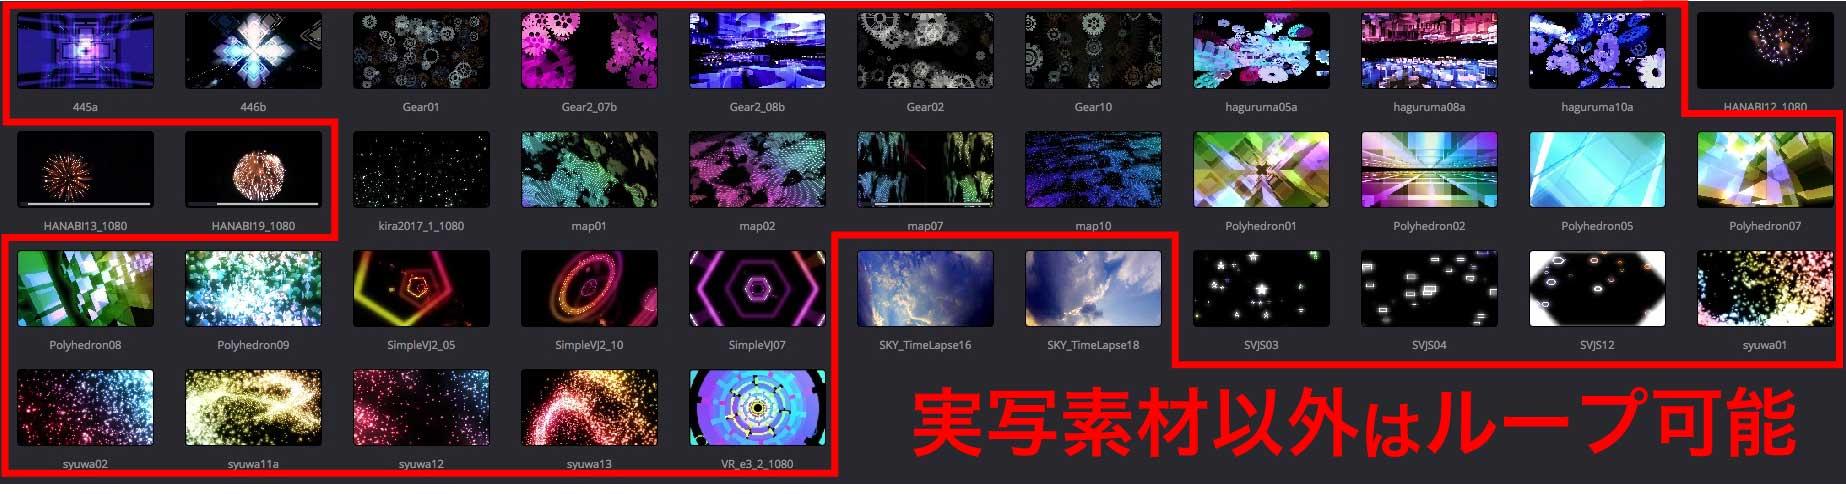 MovieMaterial HDVJ8 フルハイビジョンVJ動画素材集 画像11